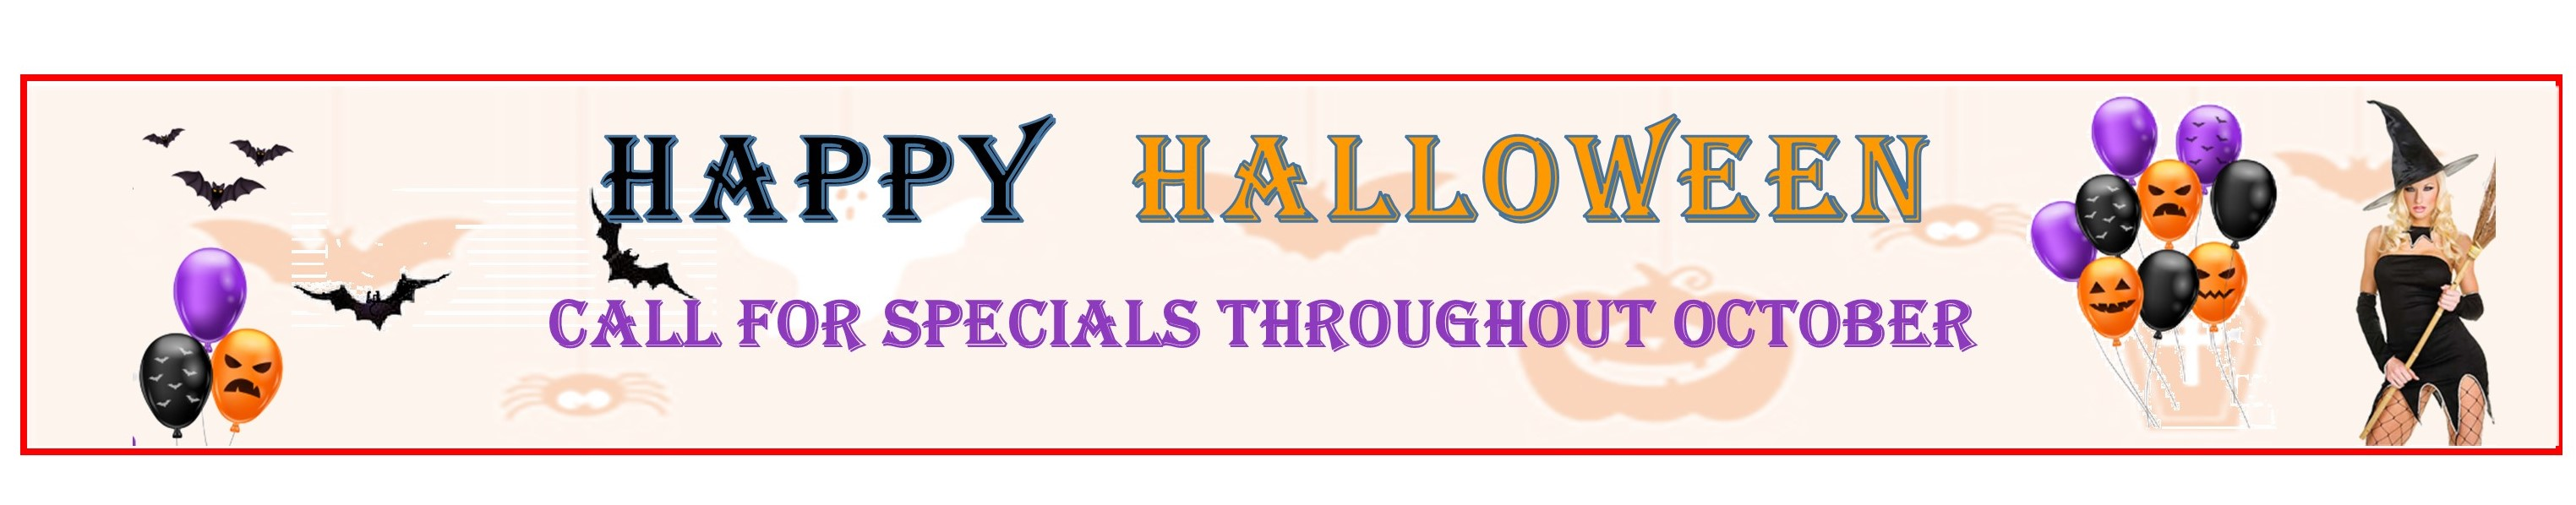 halloween-2021banner.jpg